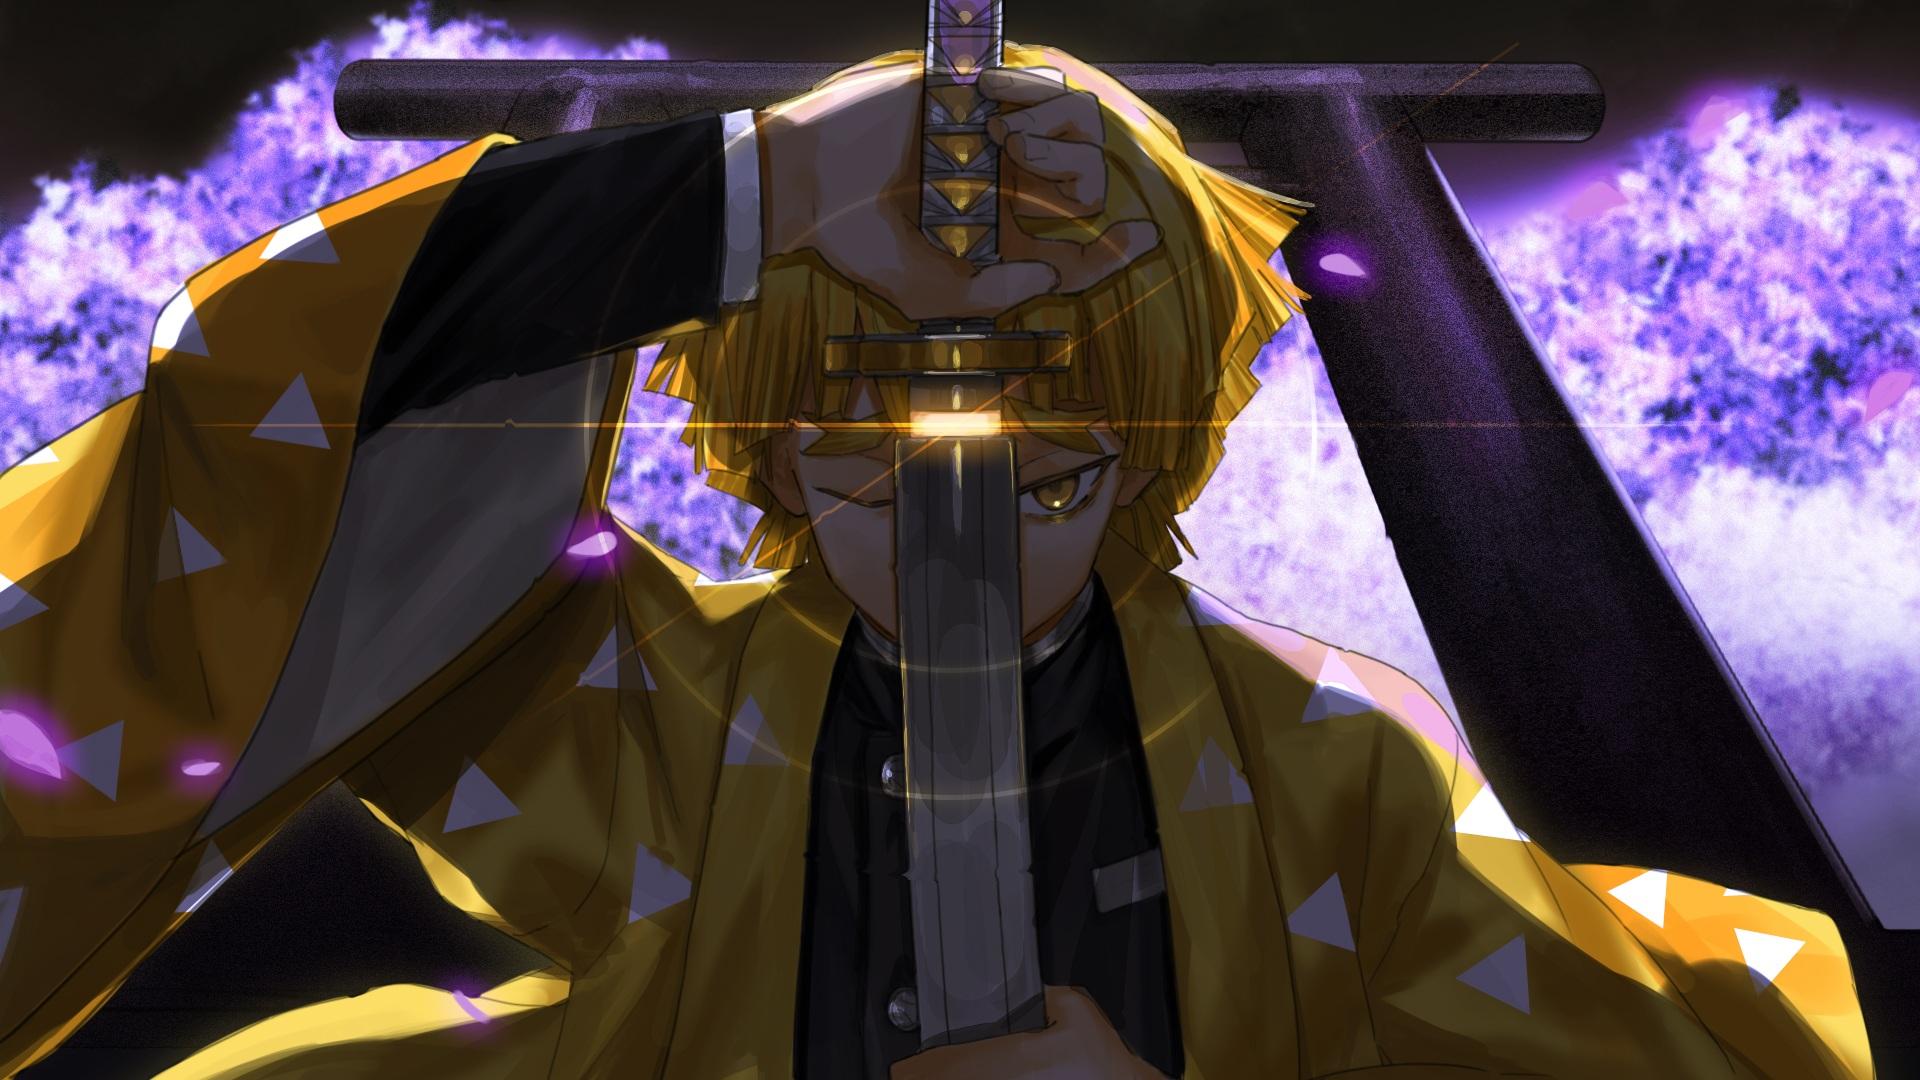 Demon slayer kimetsu no yaiba hd wallpaper background - Demon wallpaper 4k ...